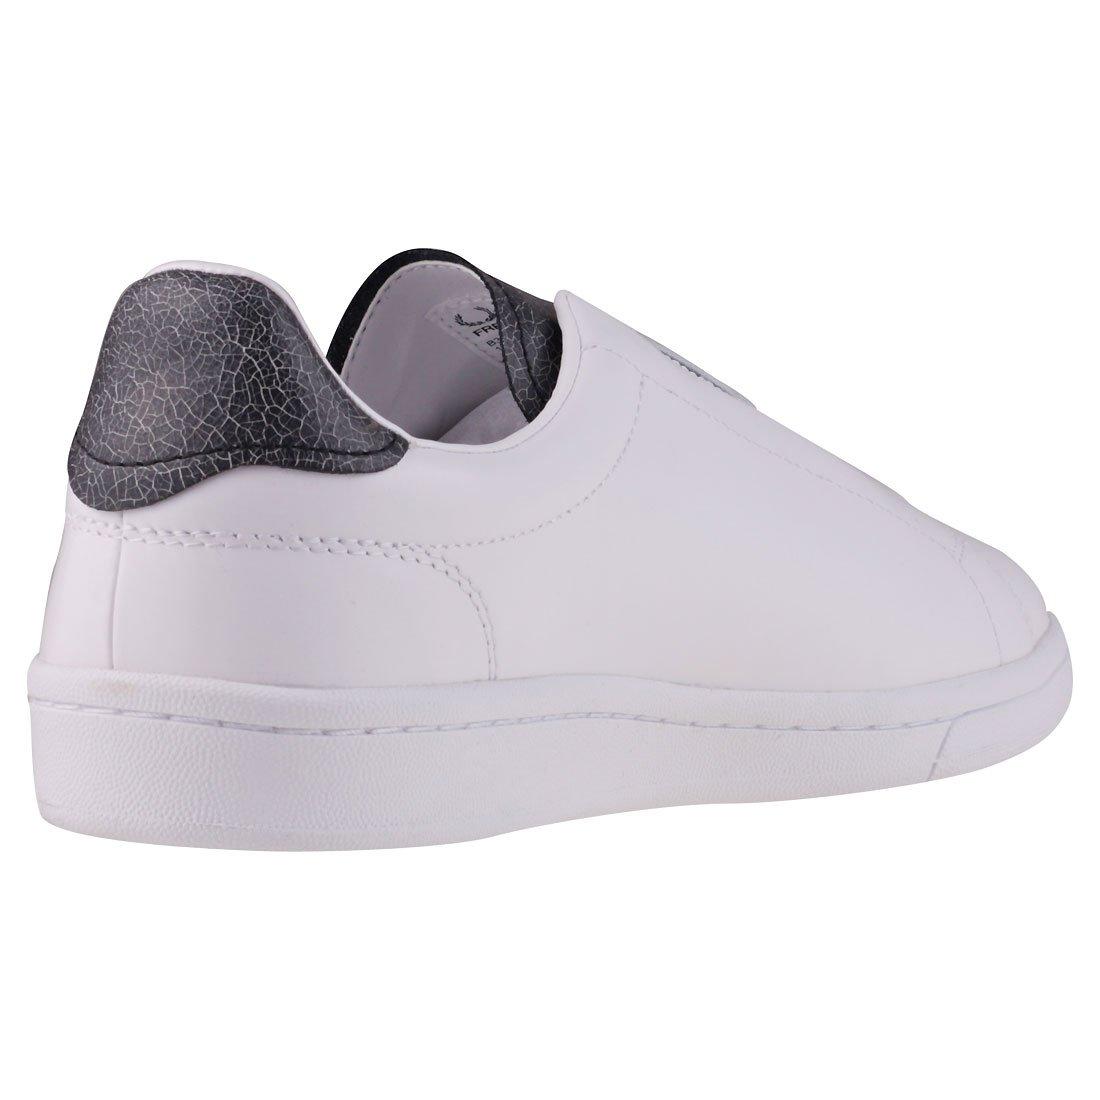 FROT Perry B721 Premium Elastic - Unisex Schuhe ohne Schnürsenkel - Elastic feaa57